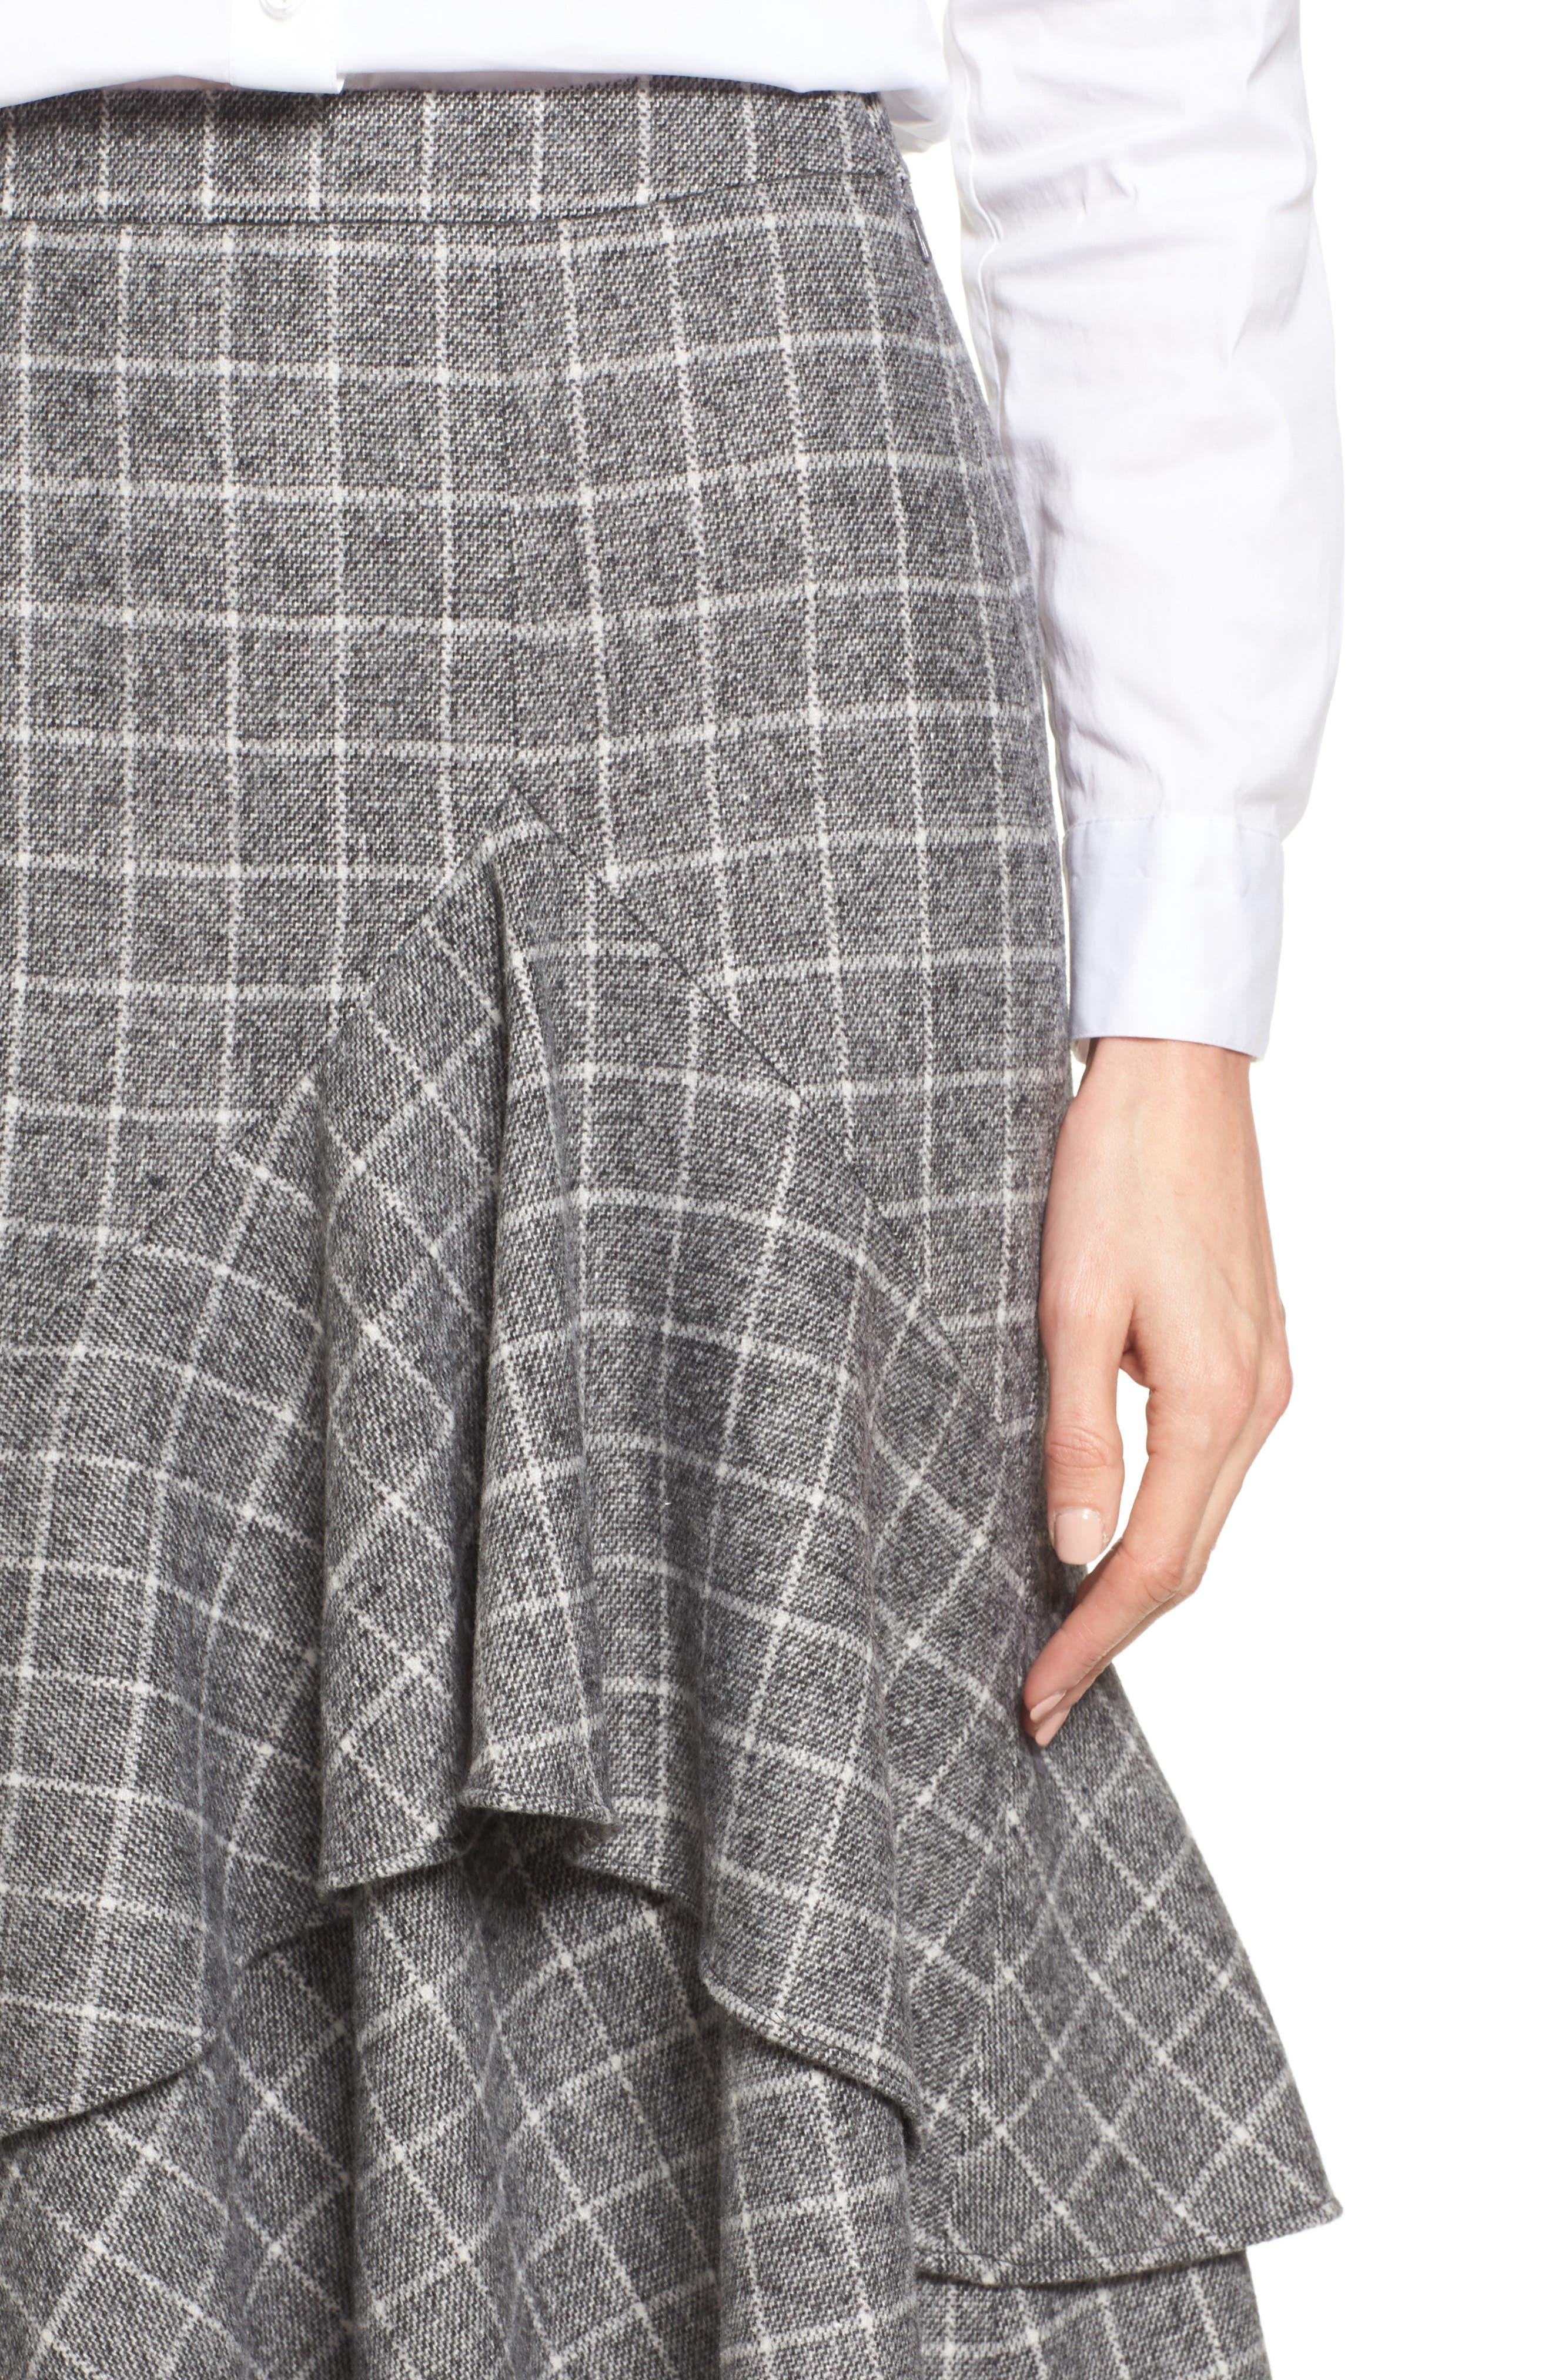 Windowpane Print Ruffle Skirt,                             Alternate thumbnail 4, color,                             001